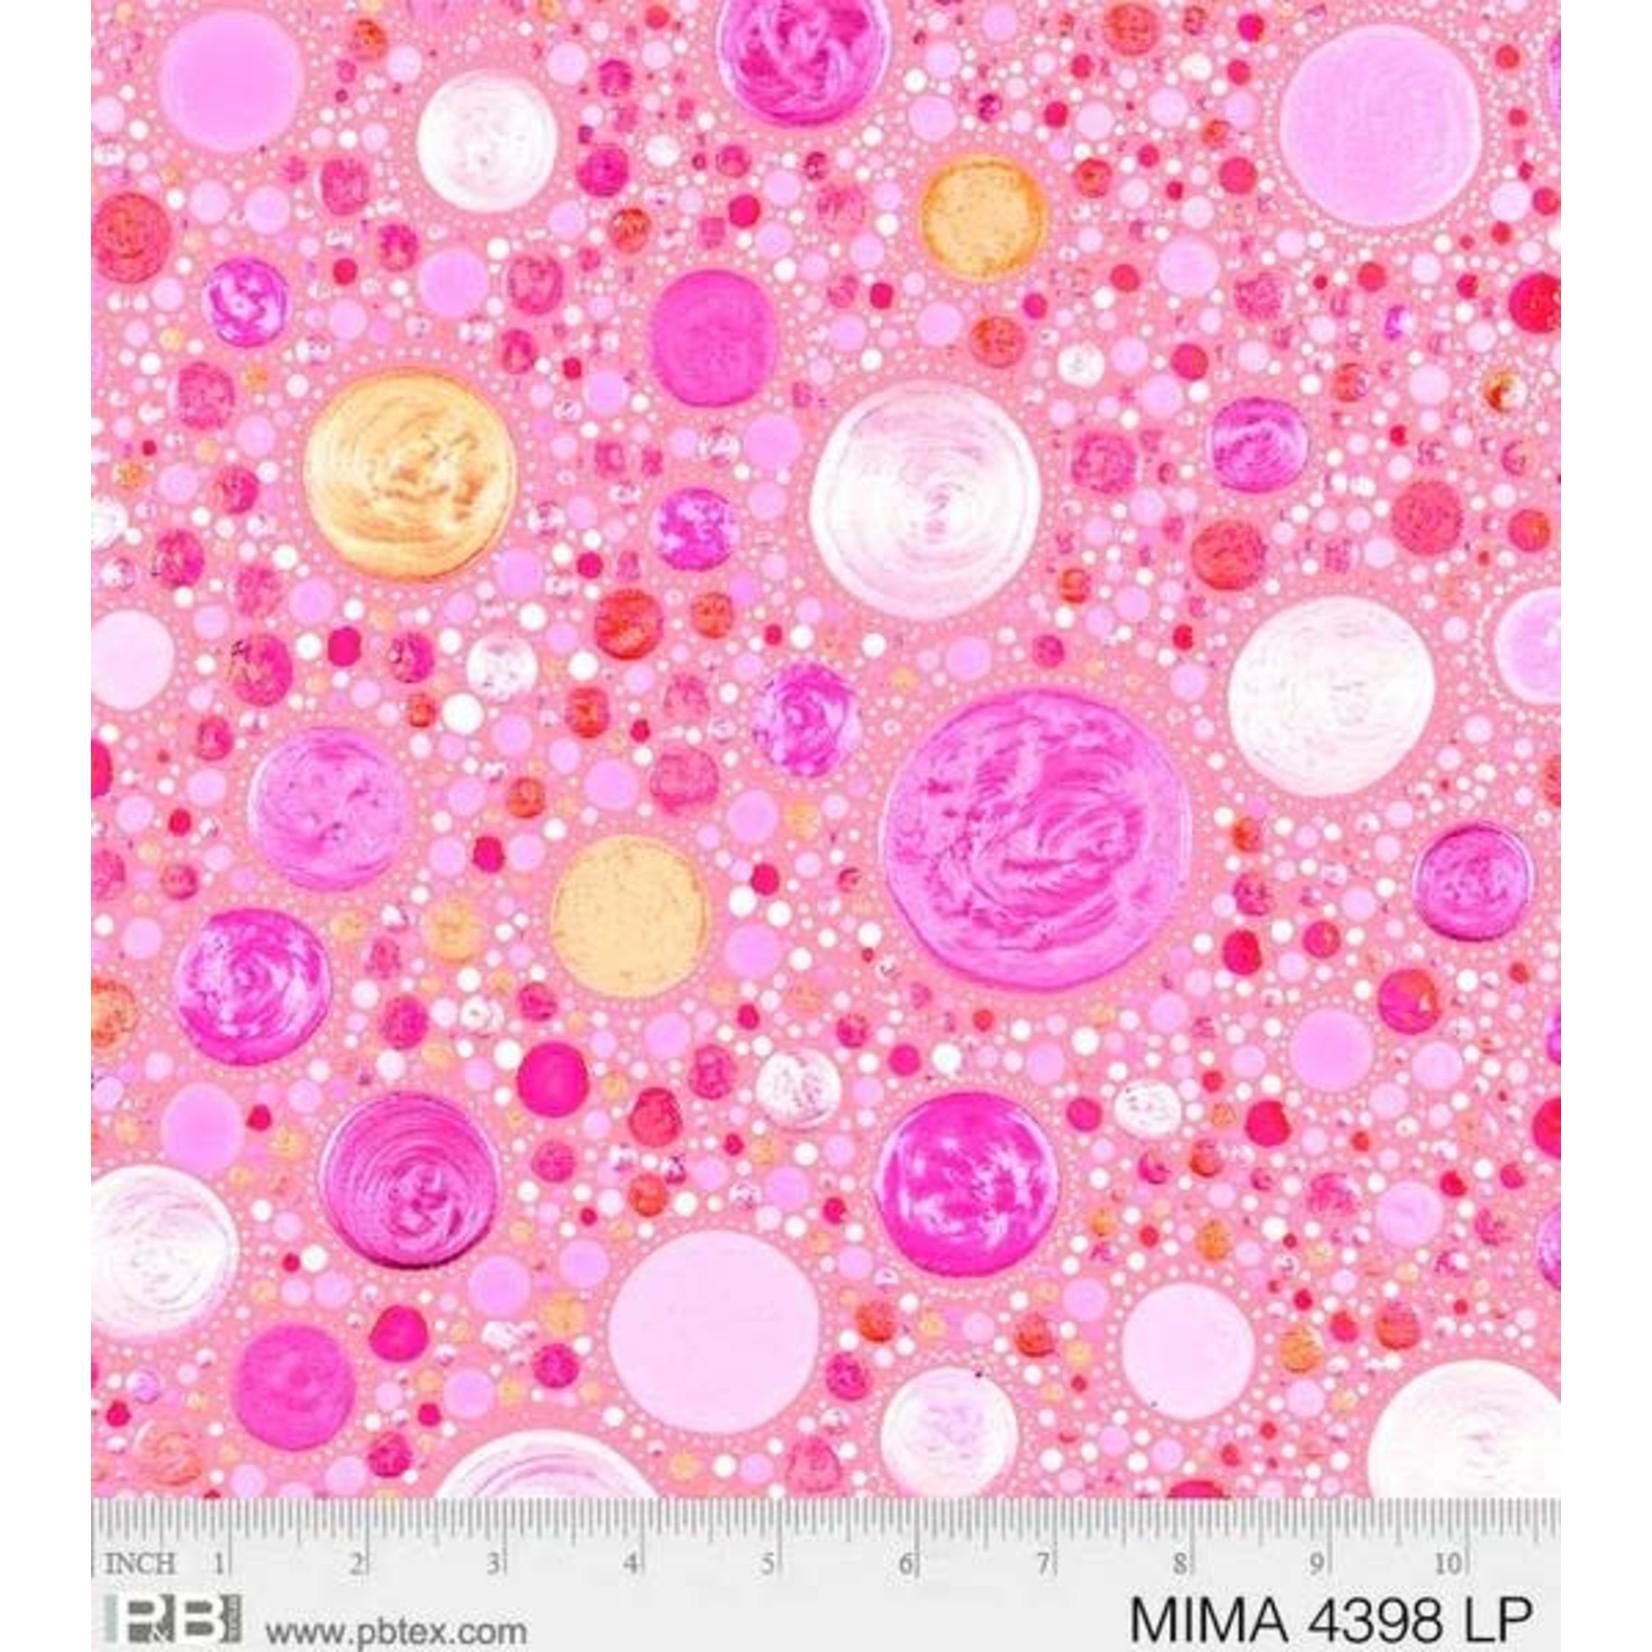 P&B Textiles Mindful Mandalas - Stones - Pink